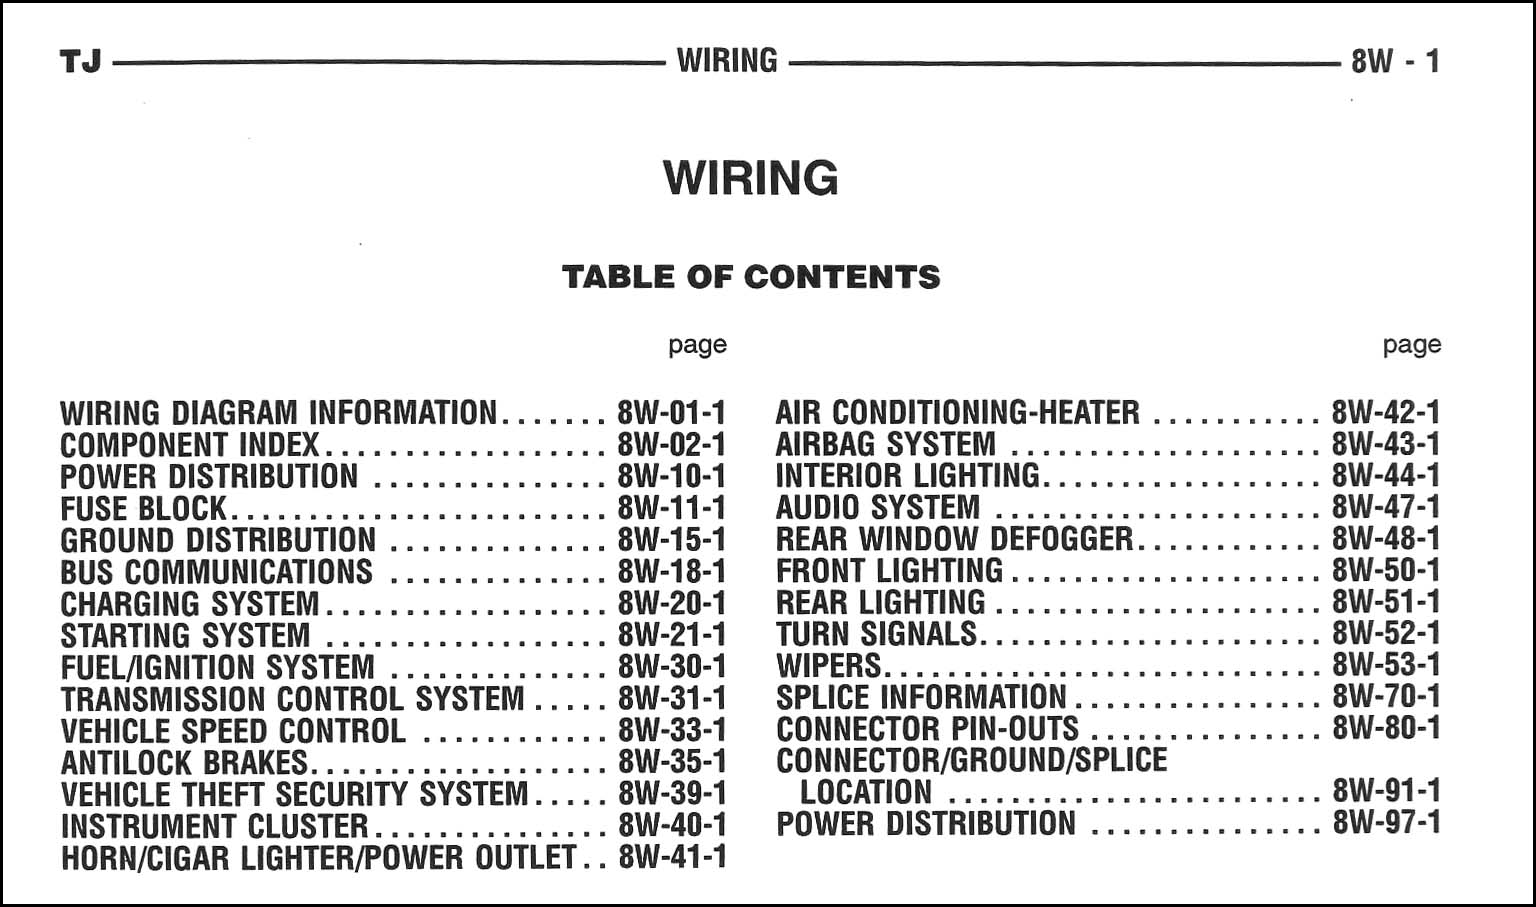 2005JeepWranglerOWD TOC?resize=665%2C393 wiring diagram for 2005 jeep wrangler readingrat net 2005 jeep wrangler pcm wiring diagram at bayanpartner.co